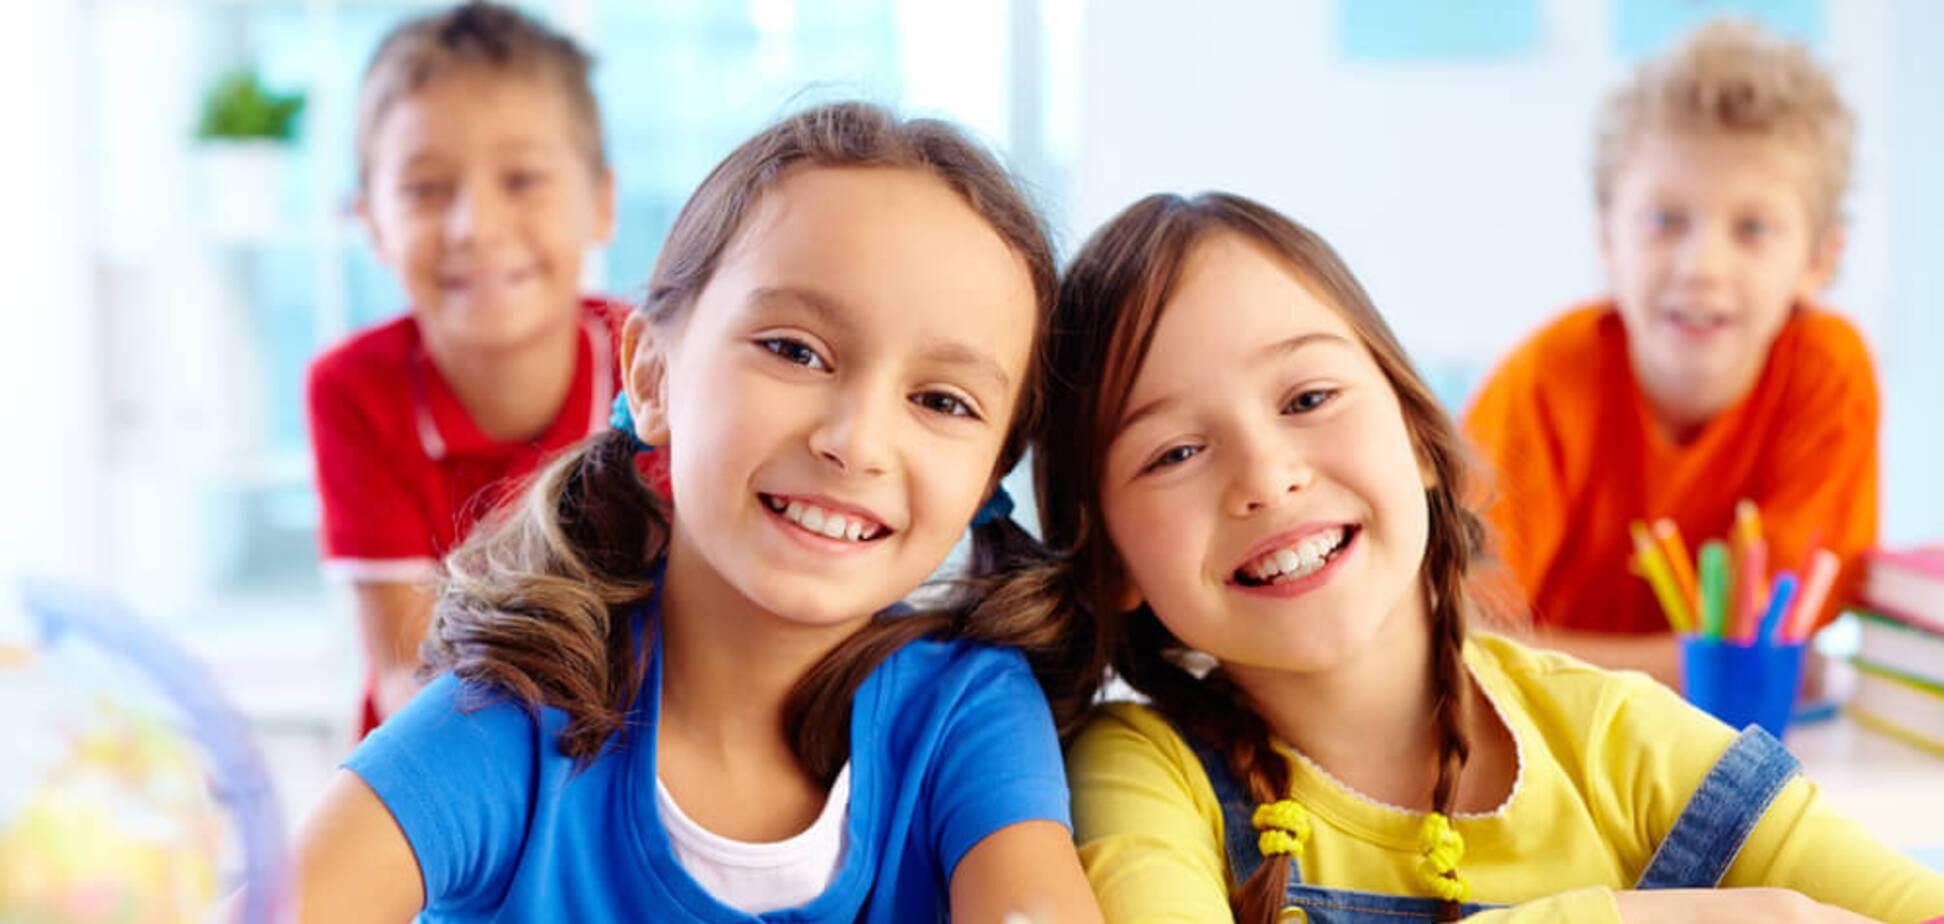 Ознаки готовності дитини до школи